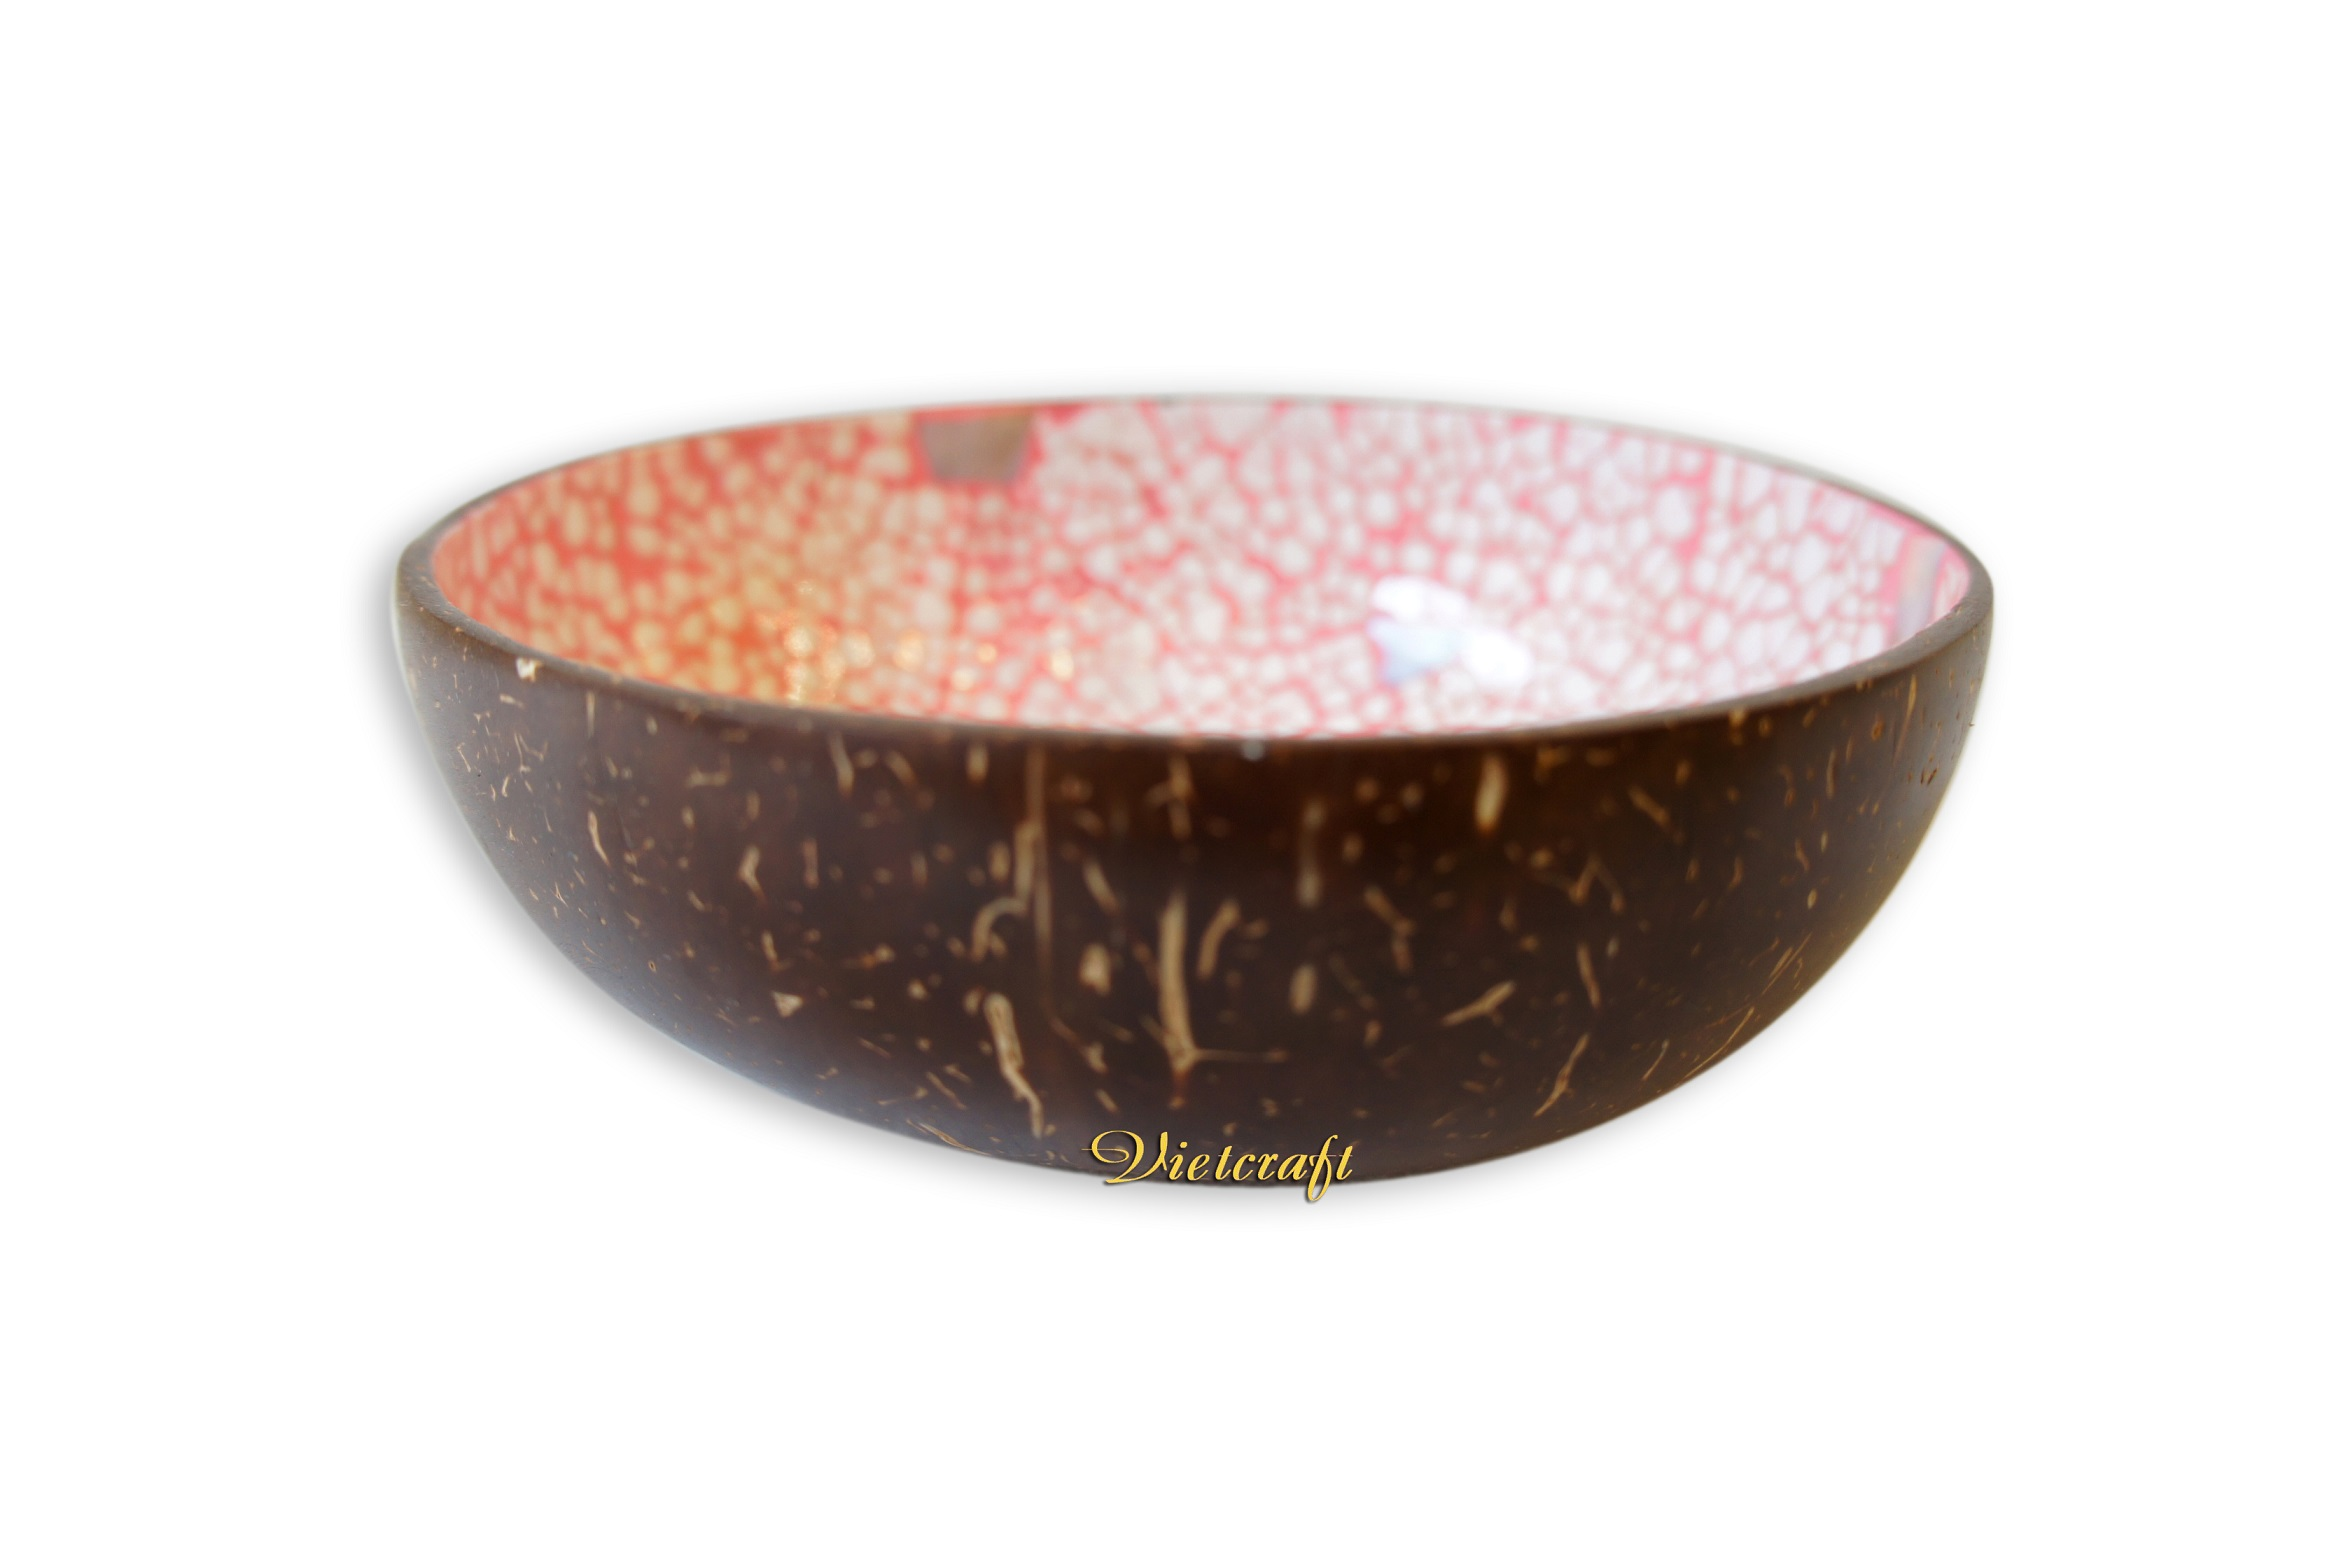 coconut bowls - photo #25